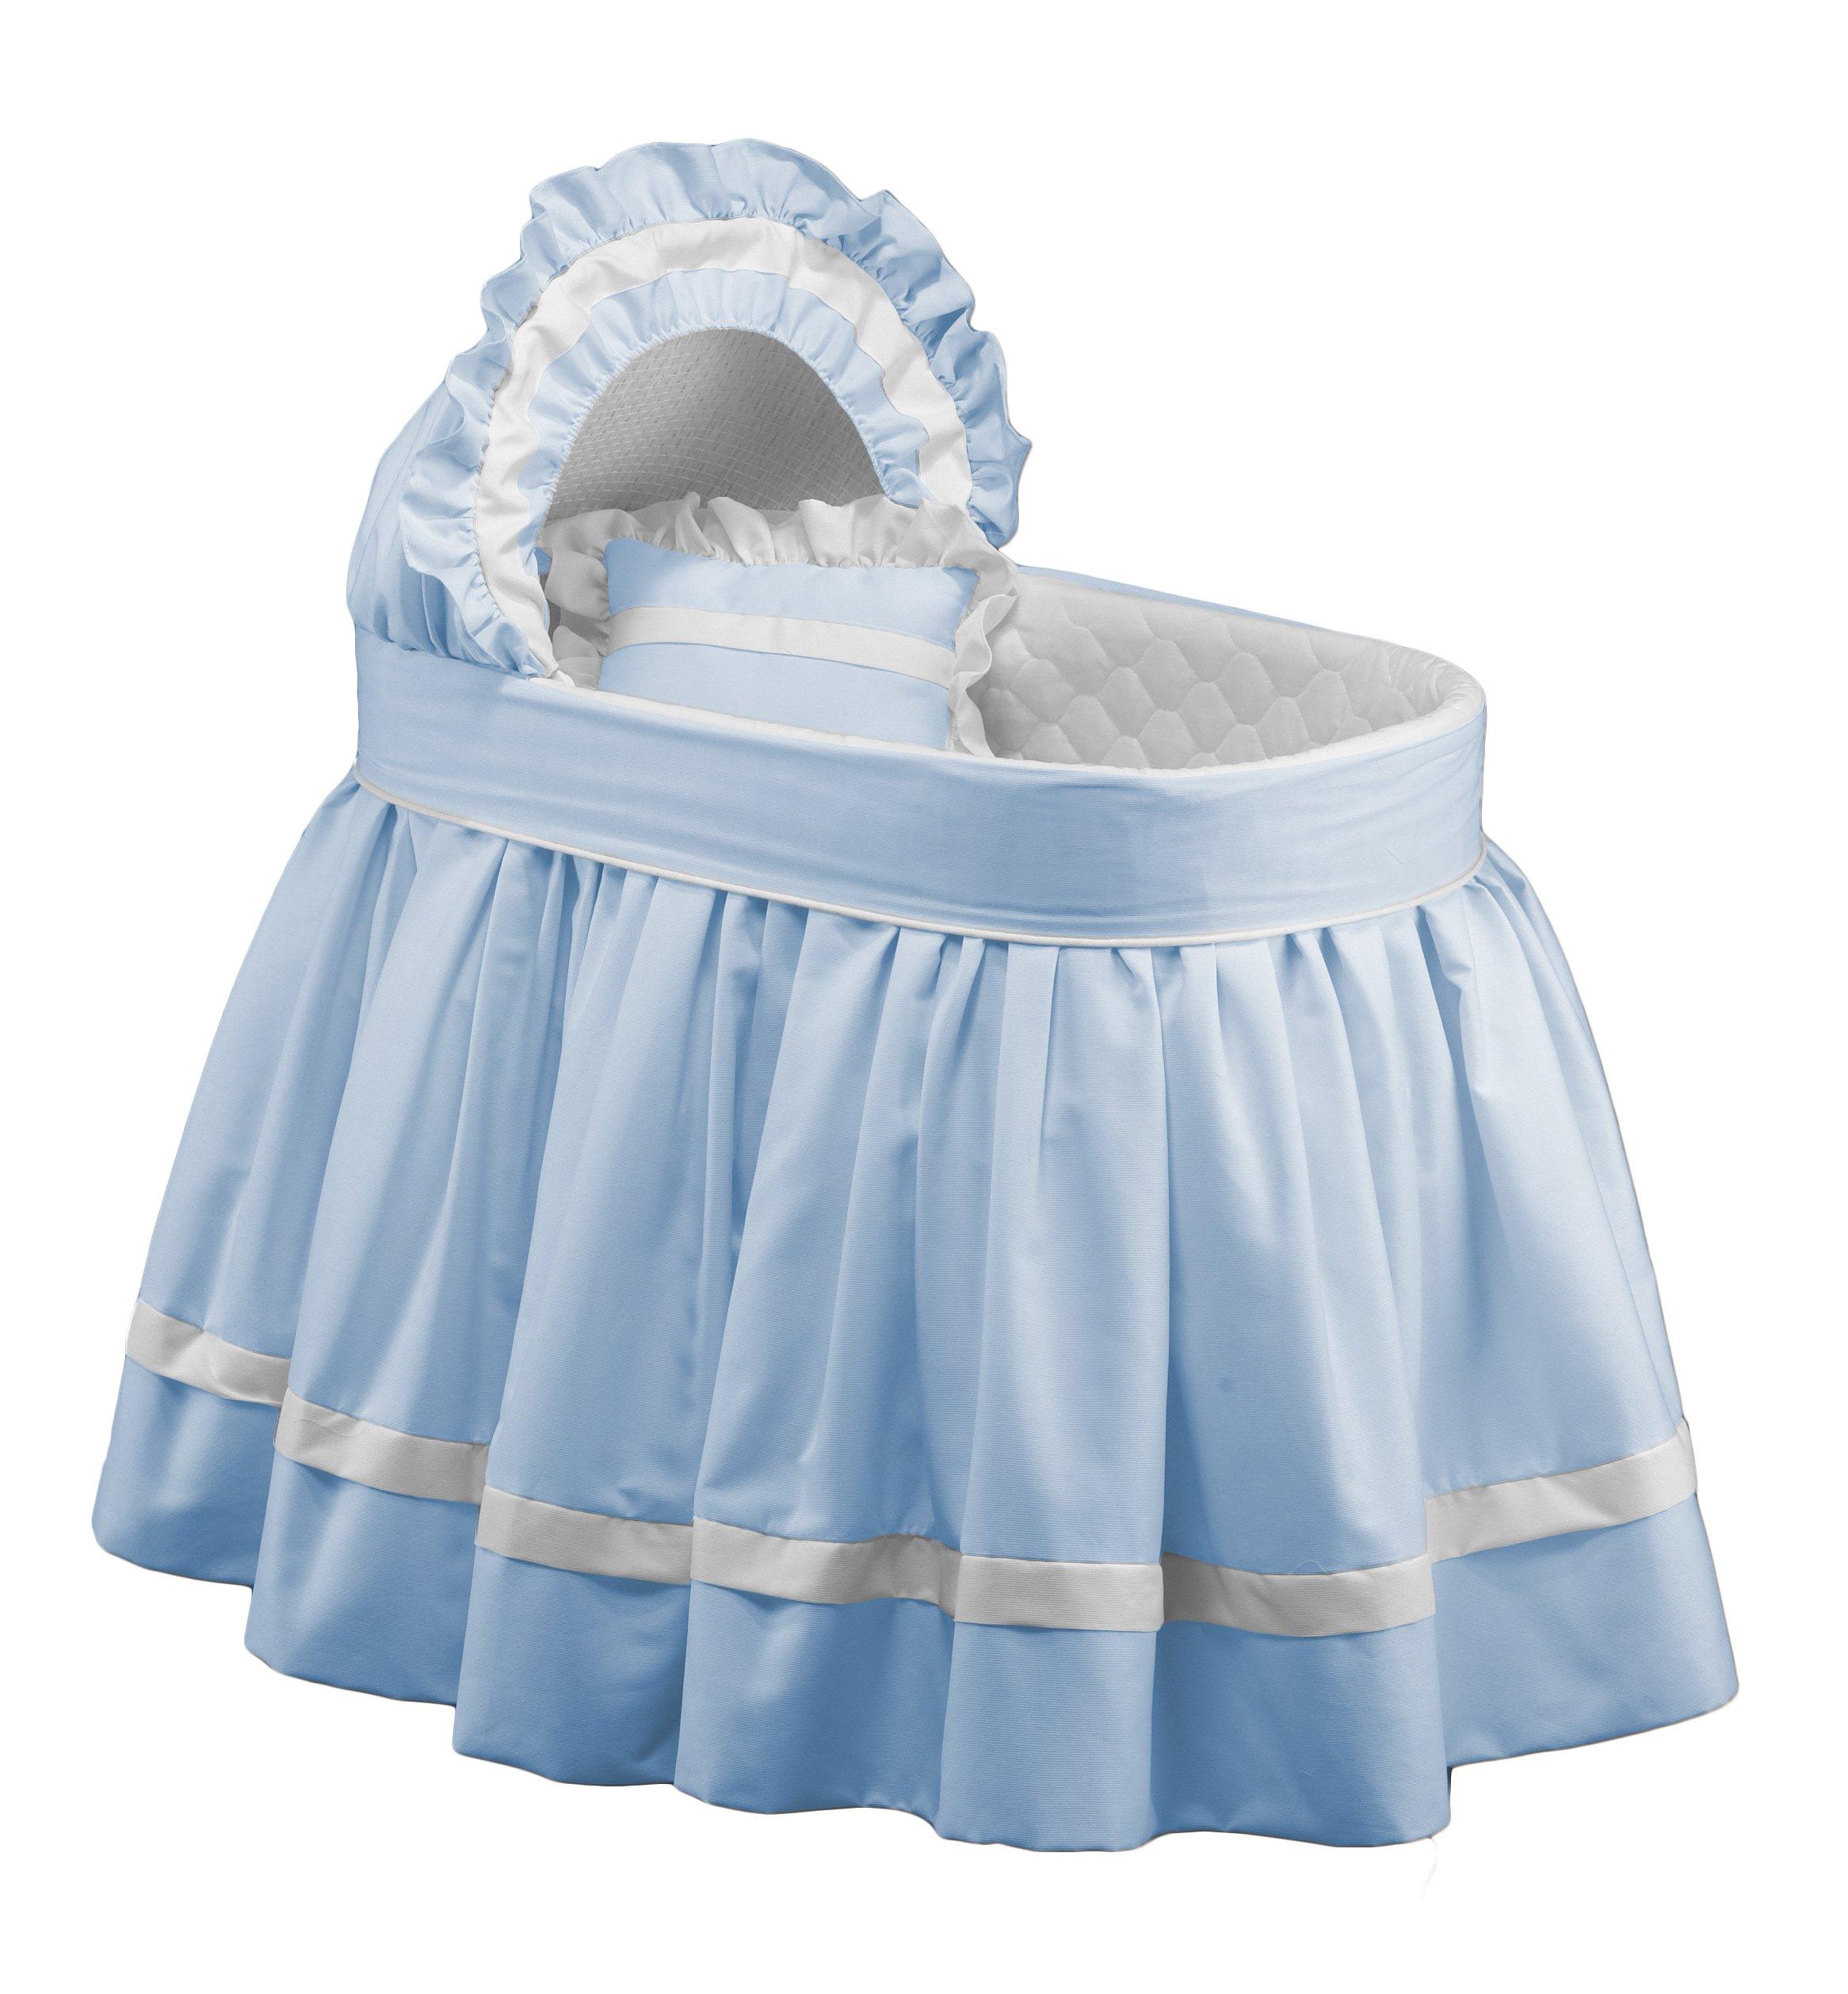 Baby Doll Bedding Regal Pique Bassinet Set, Blue